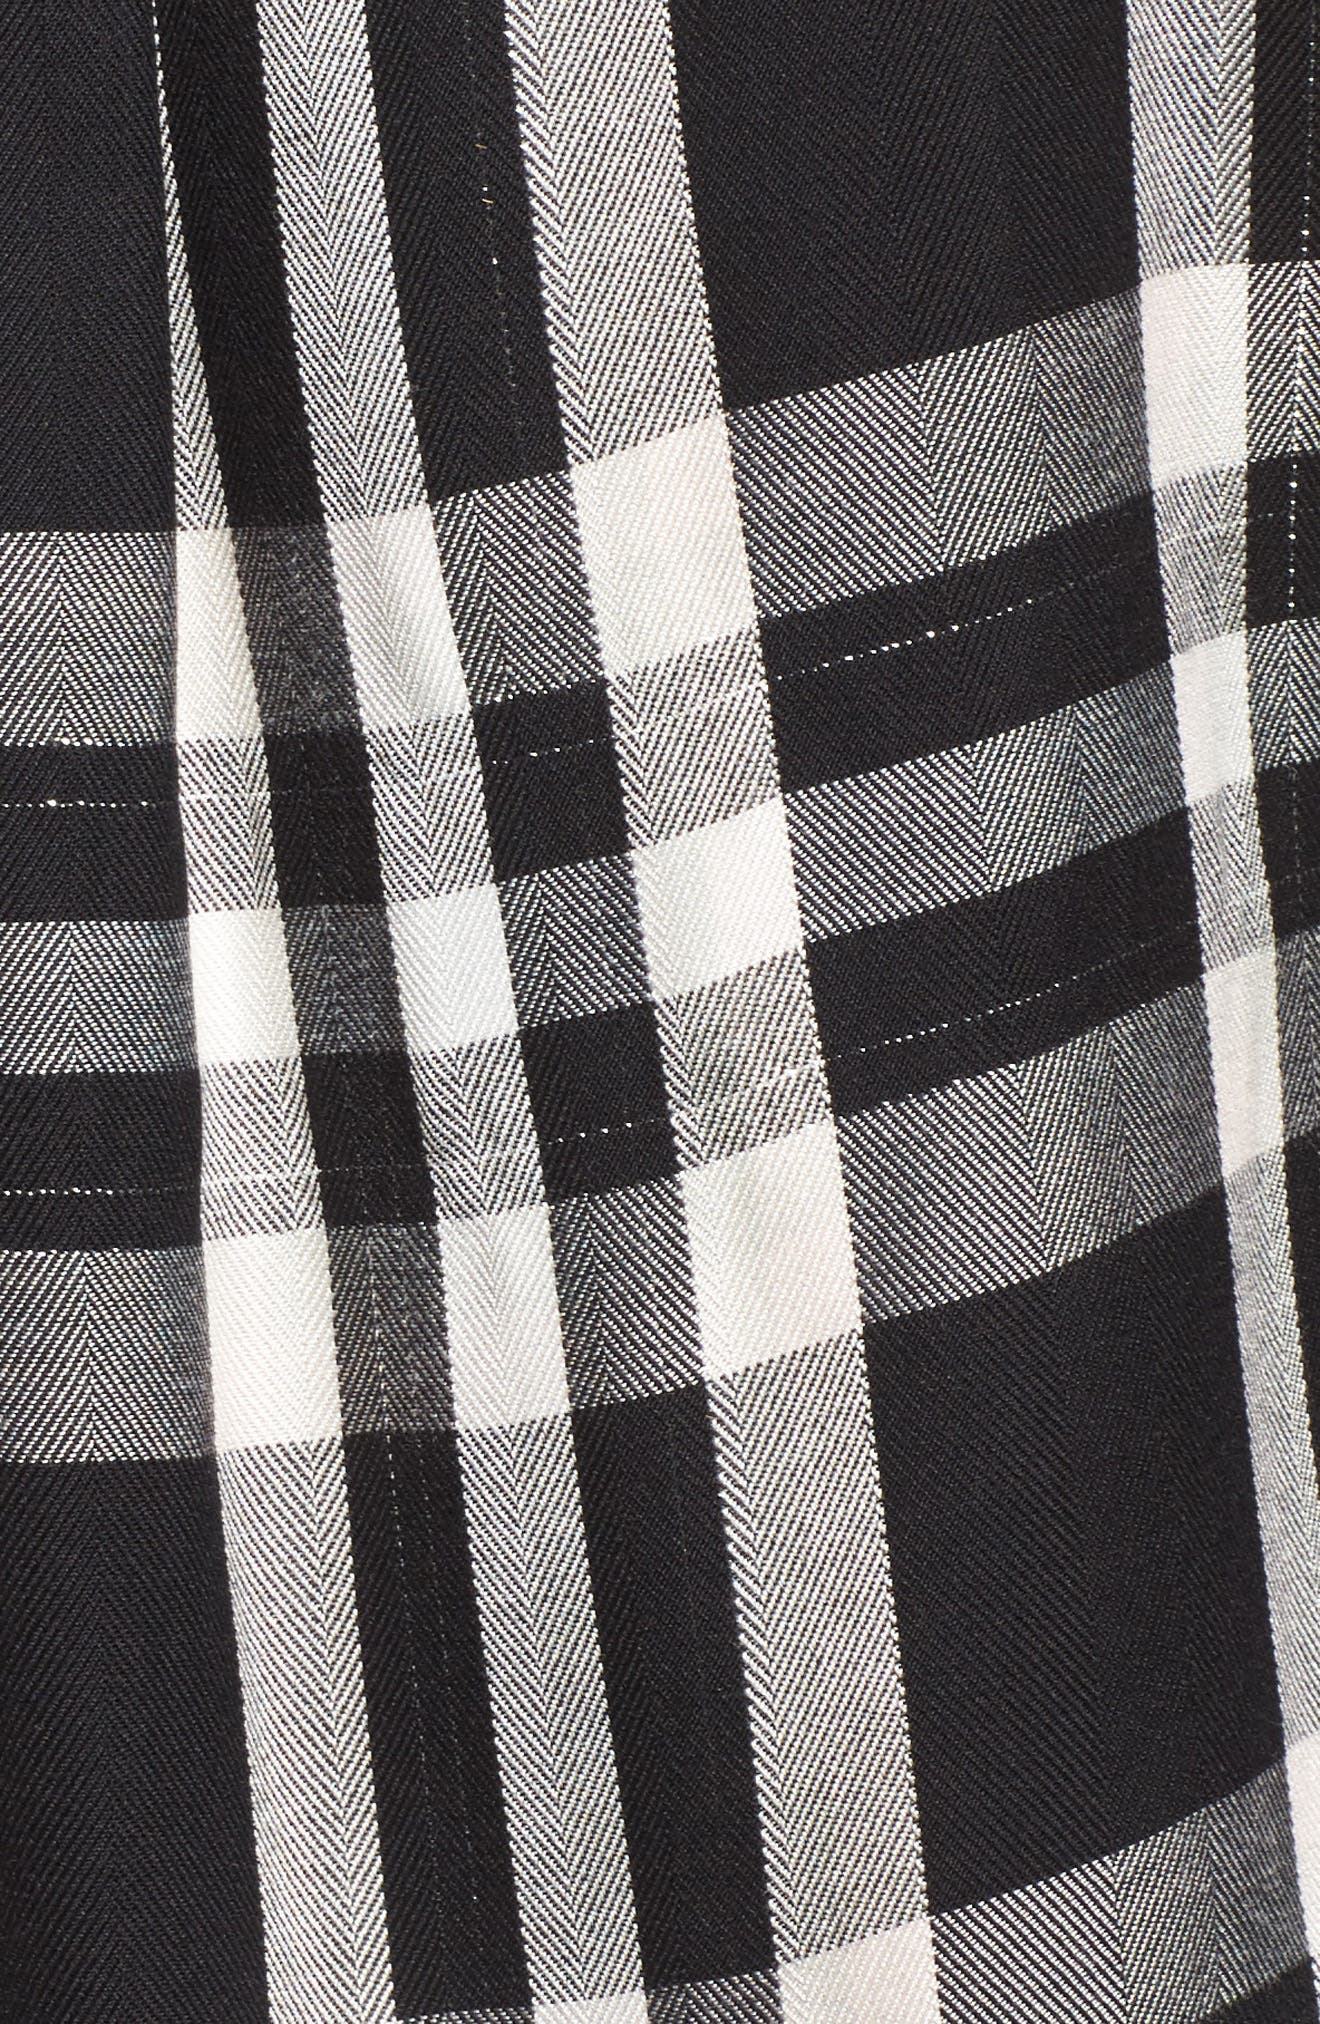 Nightfall Shirt,                             Alternate thumbnail 5, color,                             001